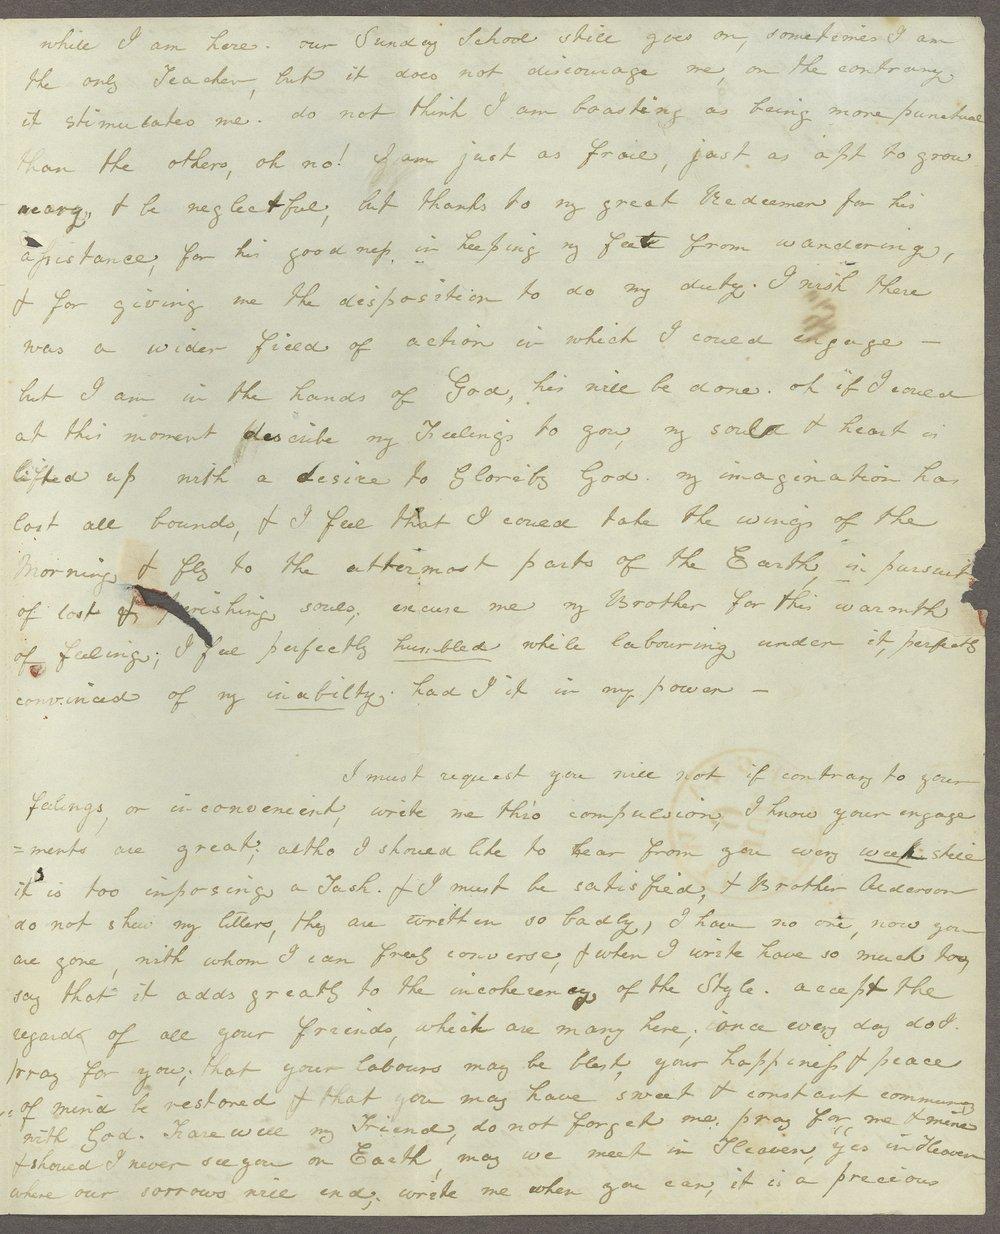 Louisa E. White to Lewis Allen Alderson - 11